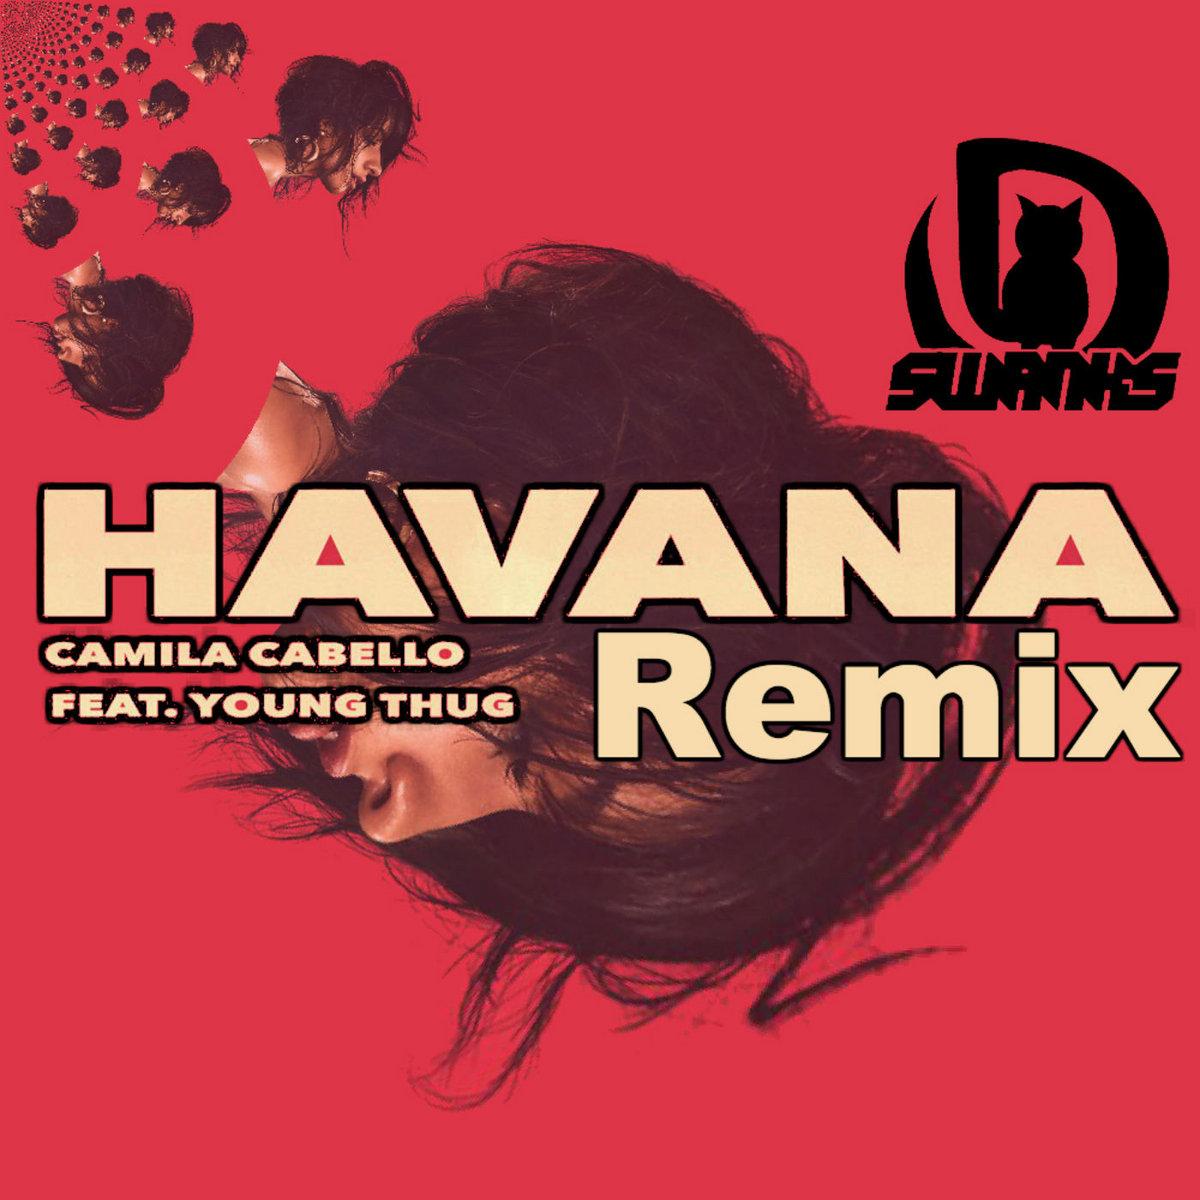 Havana Camila Cabello Ft Youg Thug Danitty Swanks Remix Dankitty Swanks